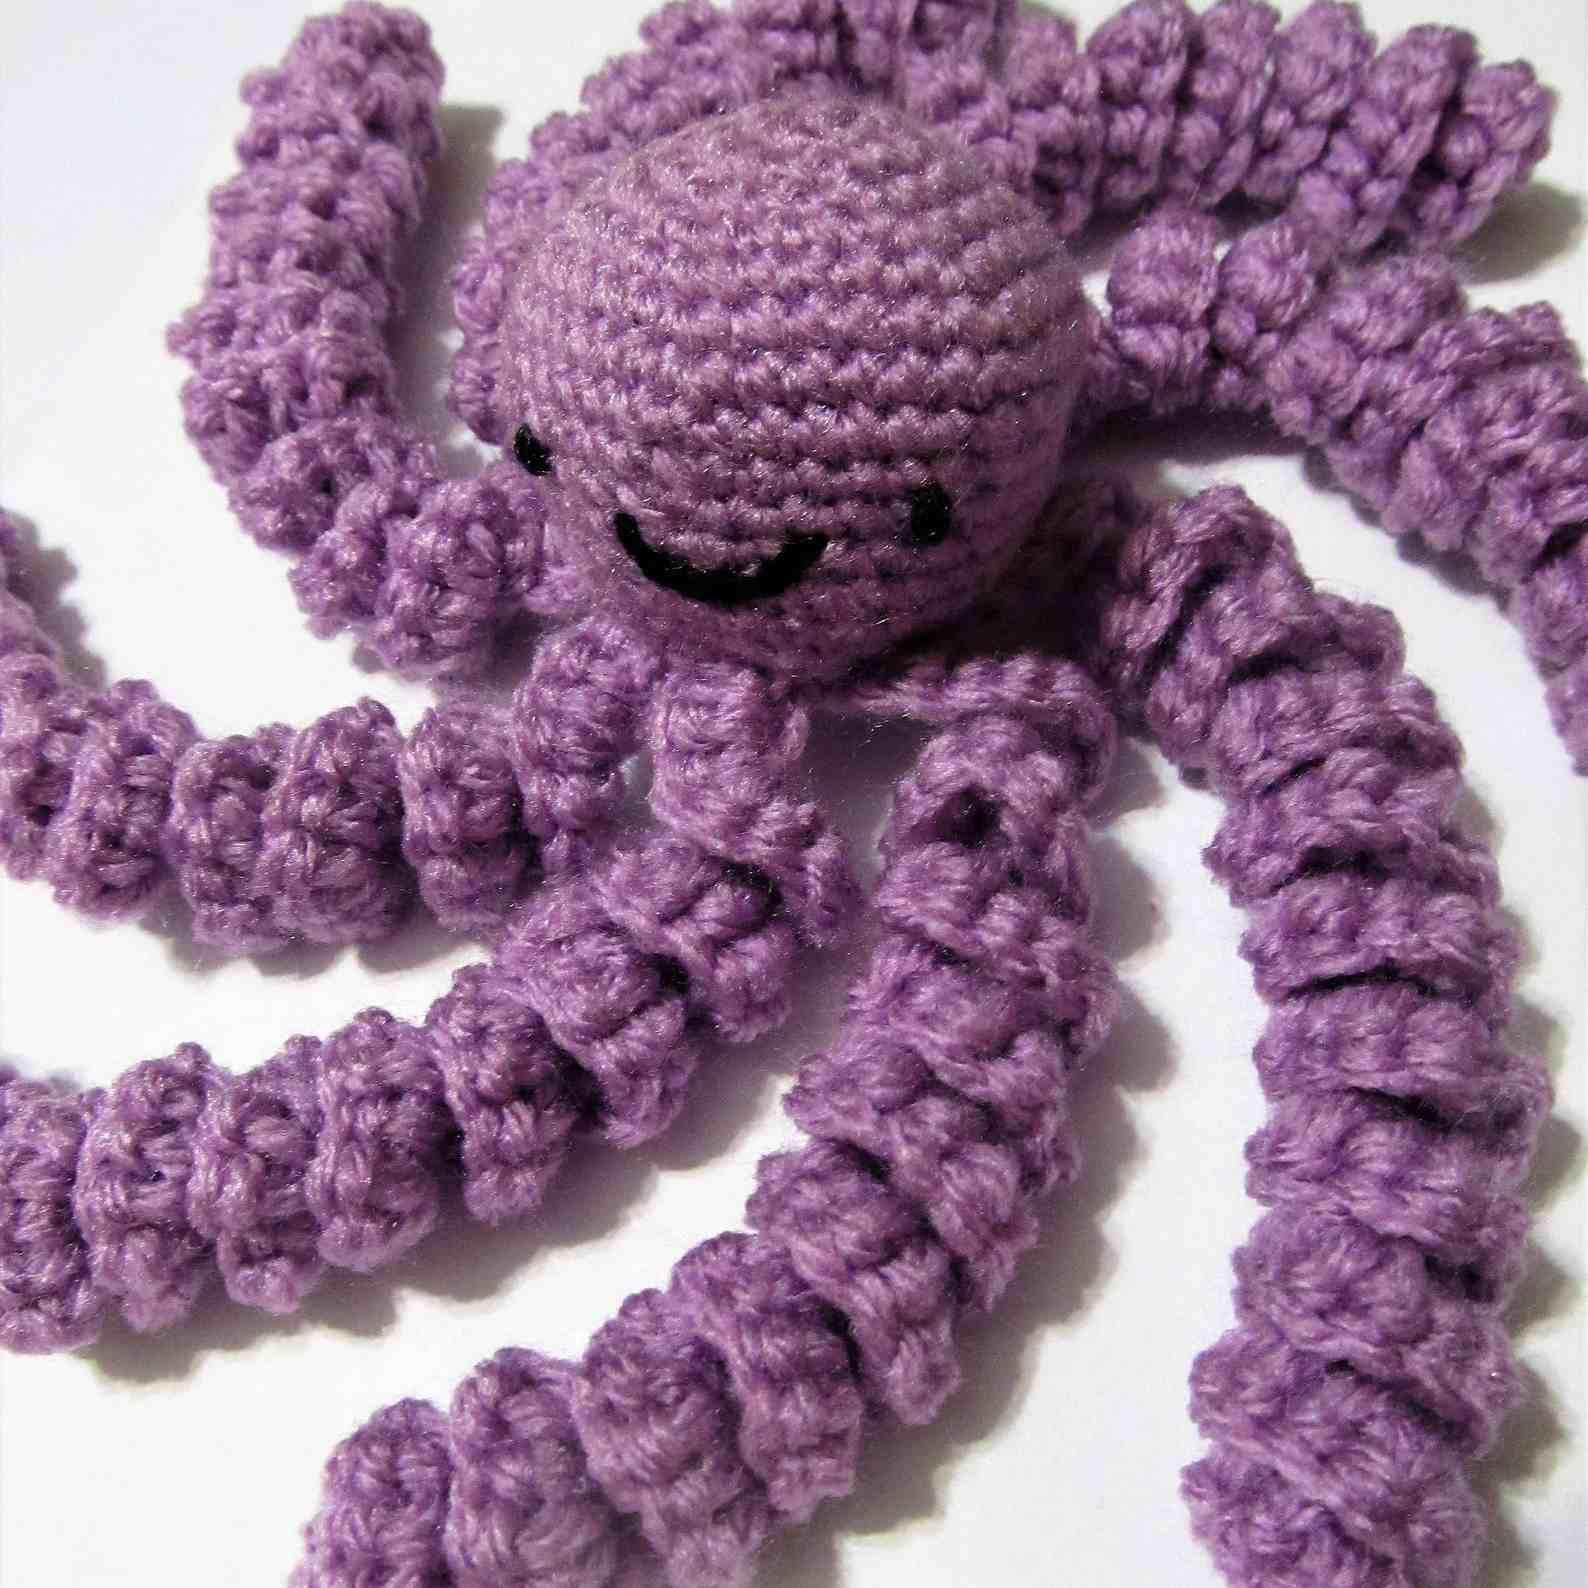 Amigurumi Free Seamless Octopus Pattern - DIY Crochet Tutorial ... | 1588x1588